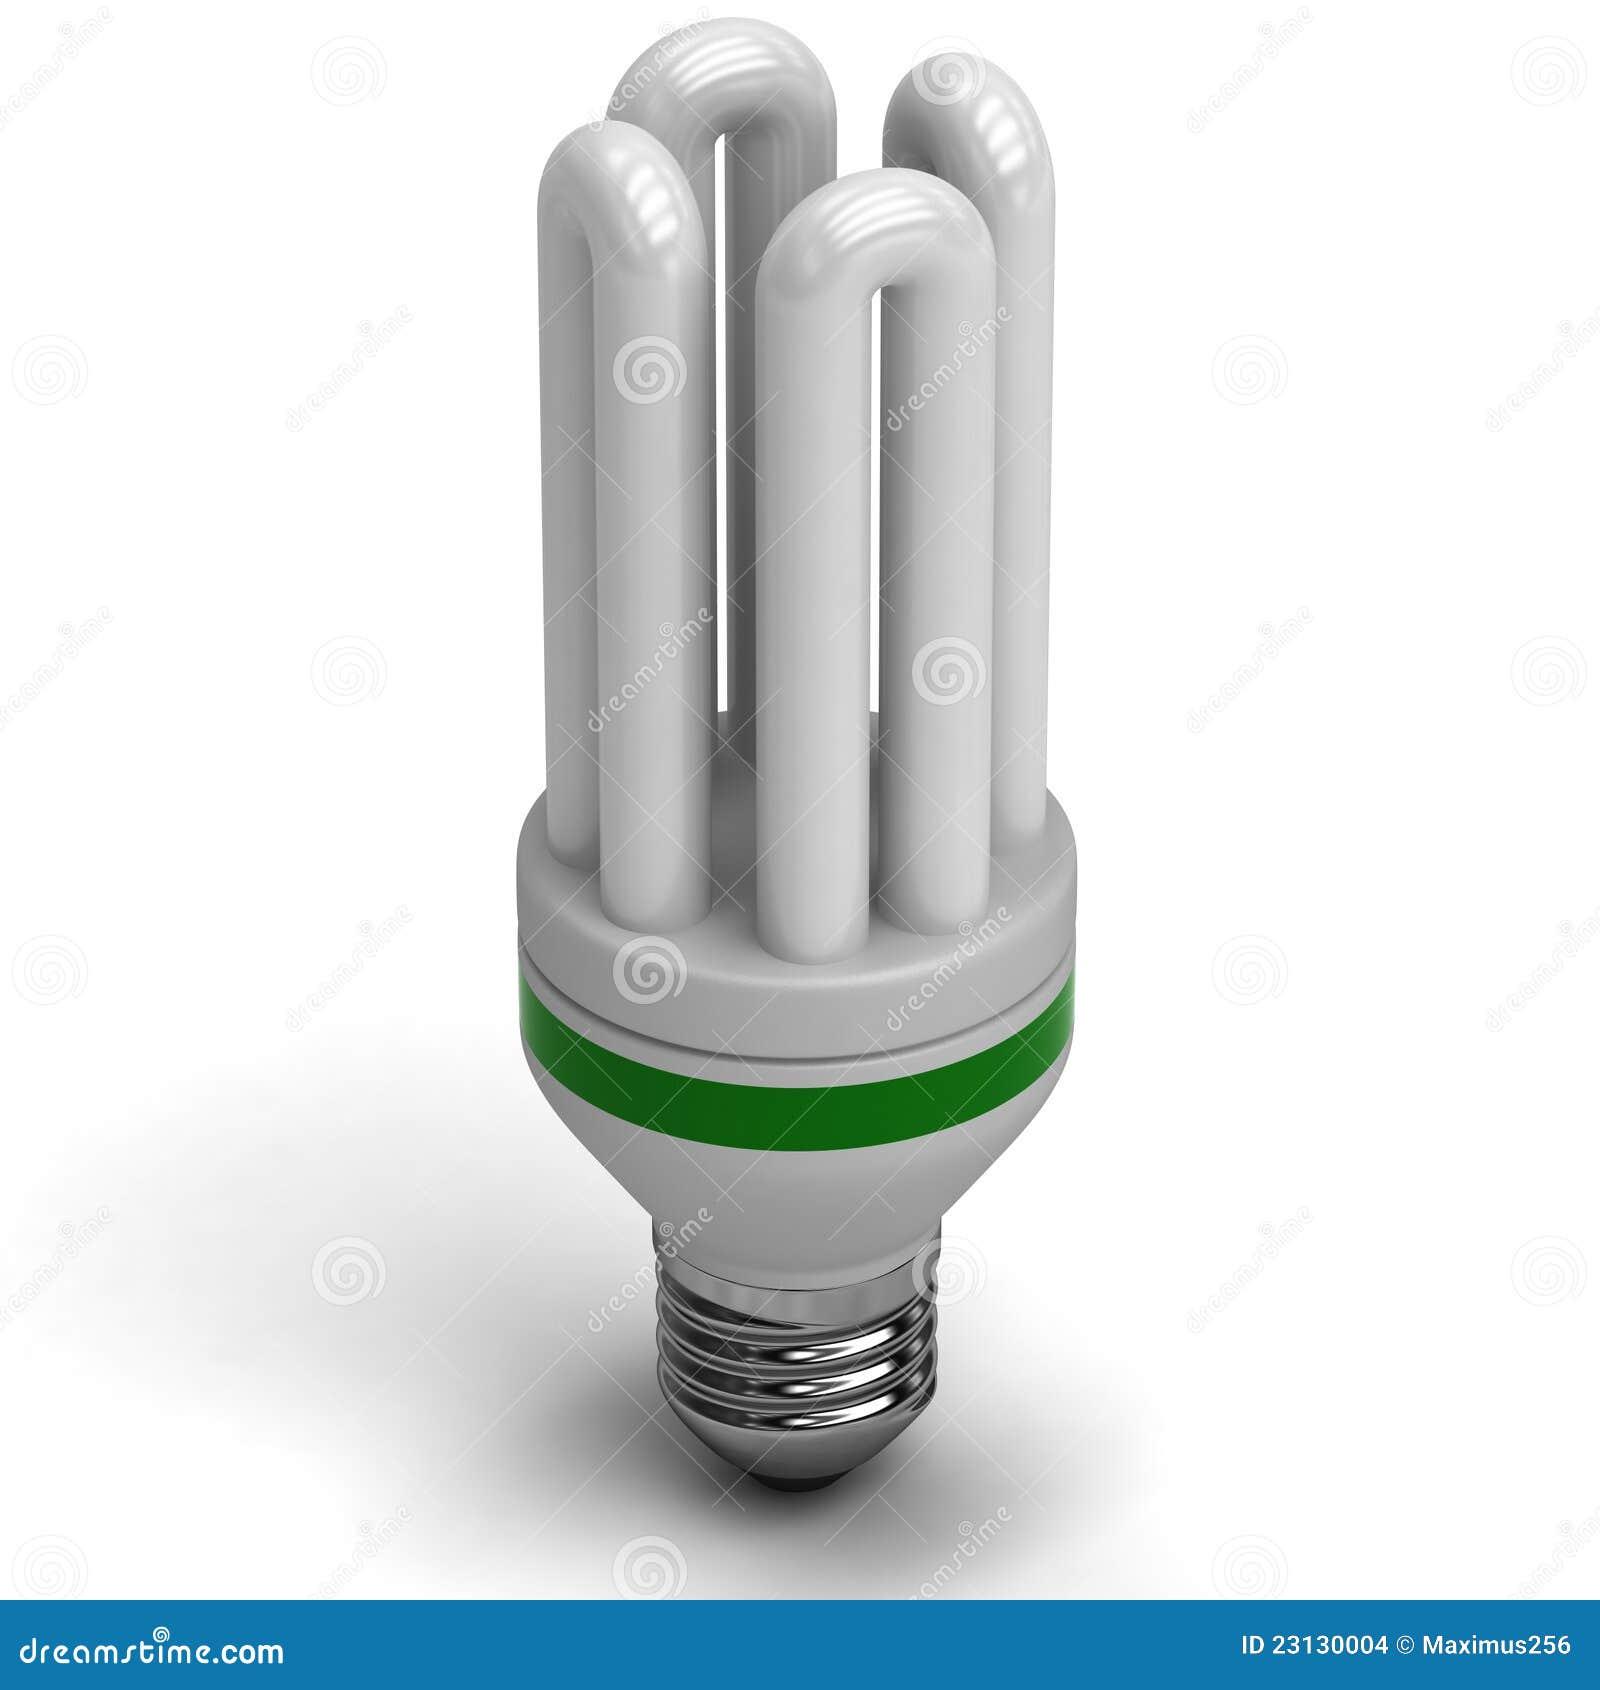 Fluorescent Energy Saving Light Bulb Stock Images Image 23130004